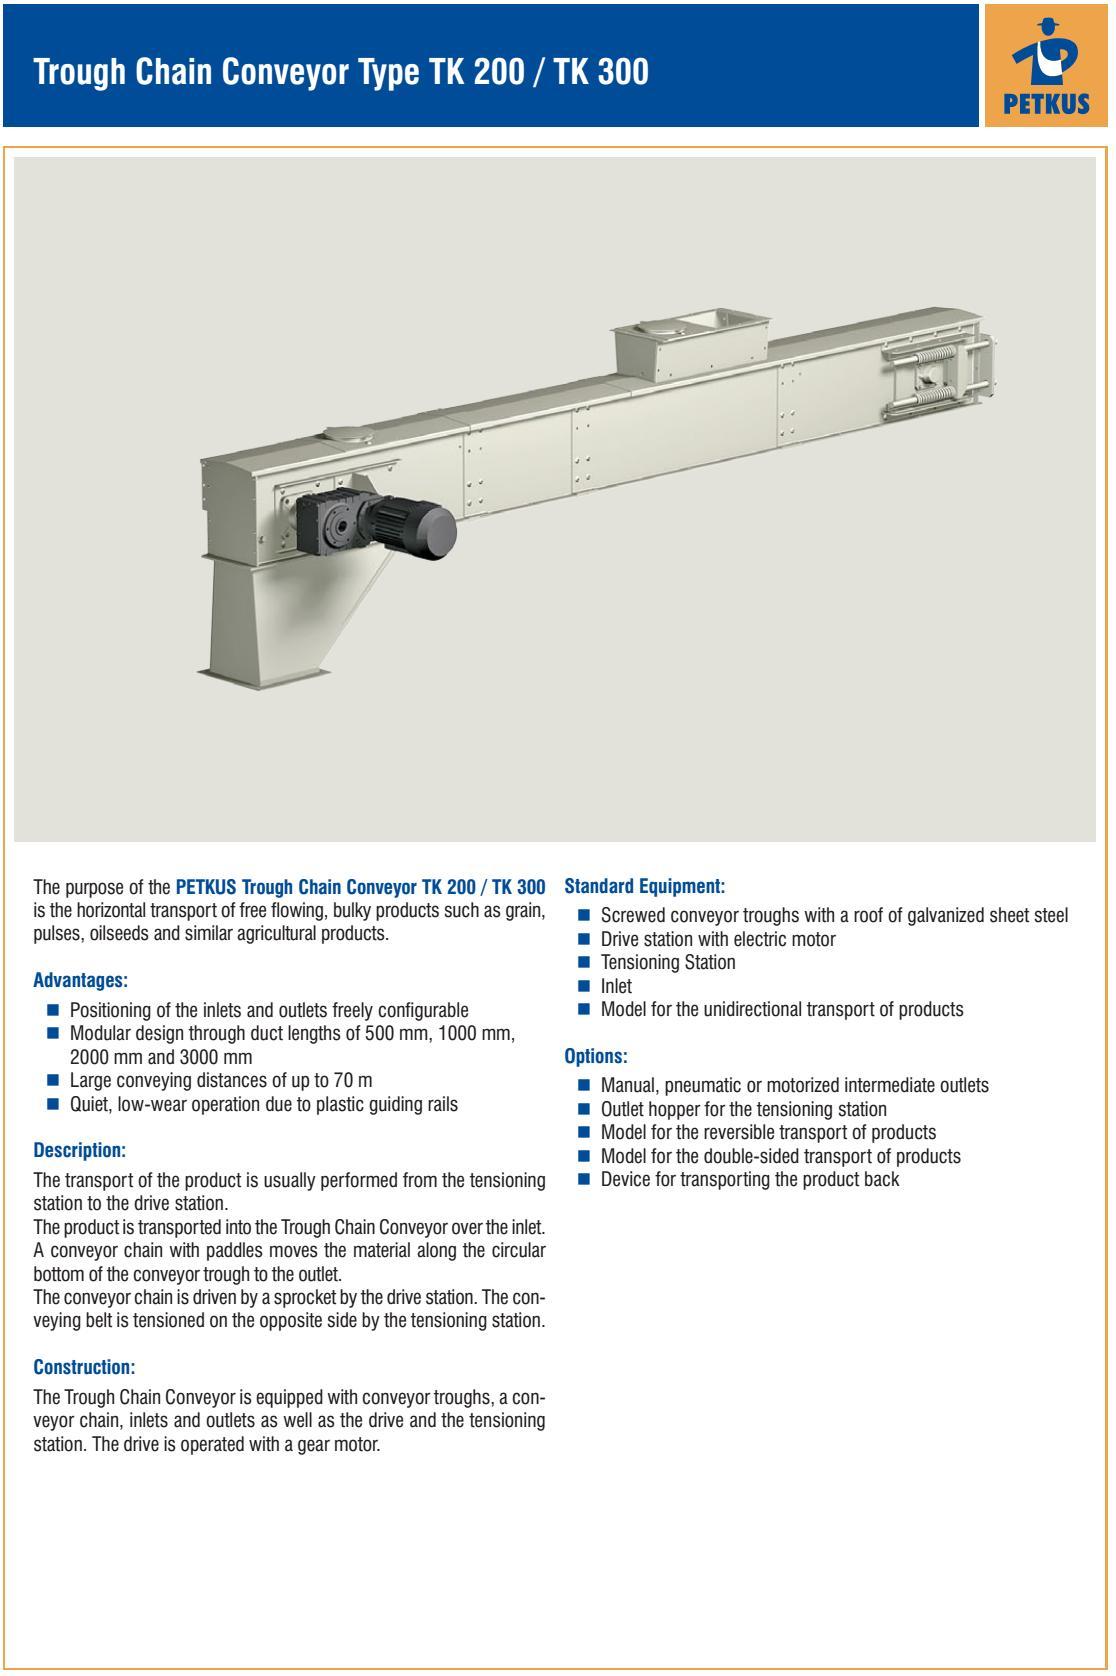 Conveying equipment: Trough Chain Conveyor TK 200 / ТК 300